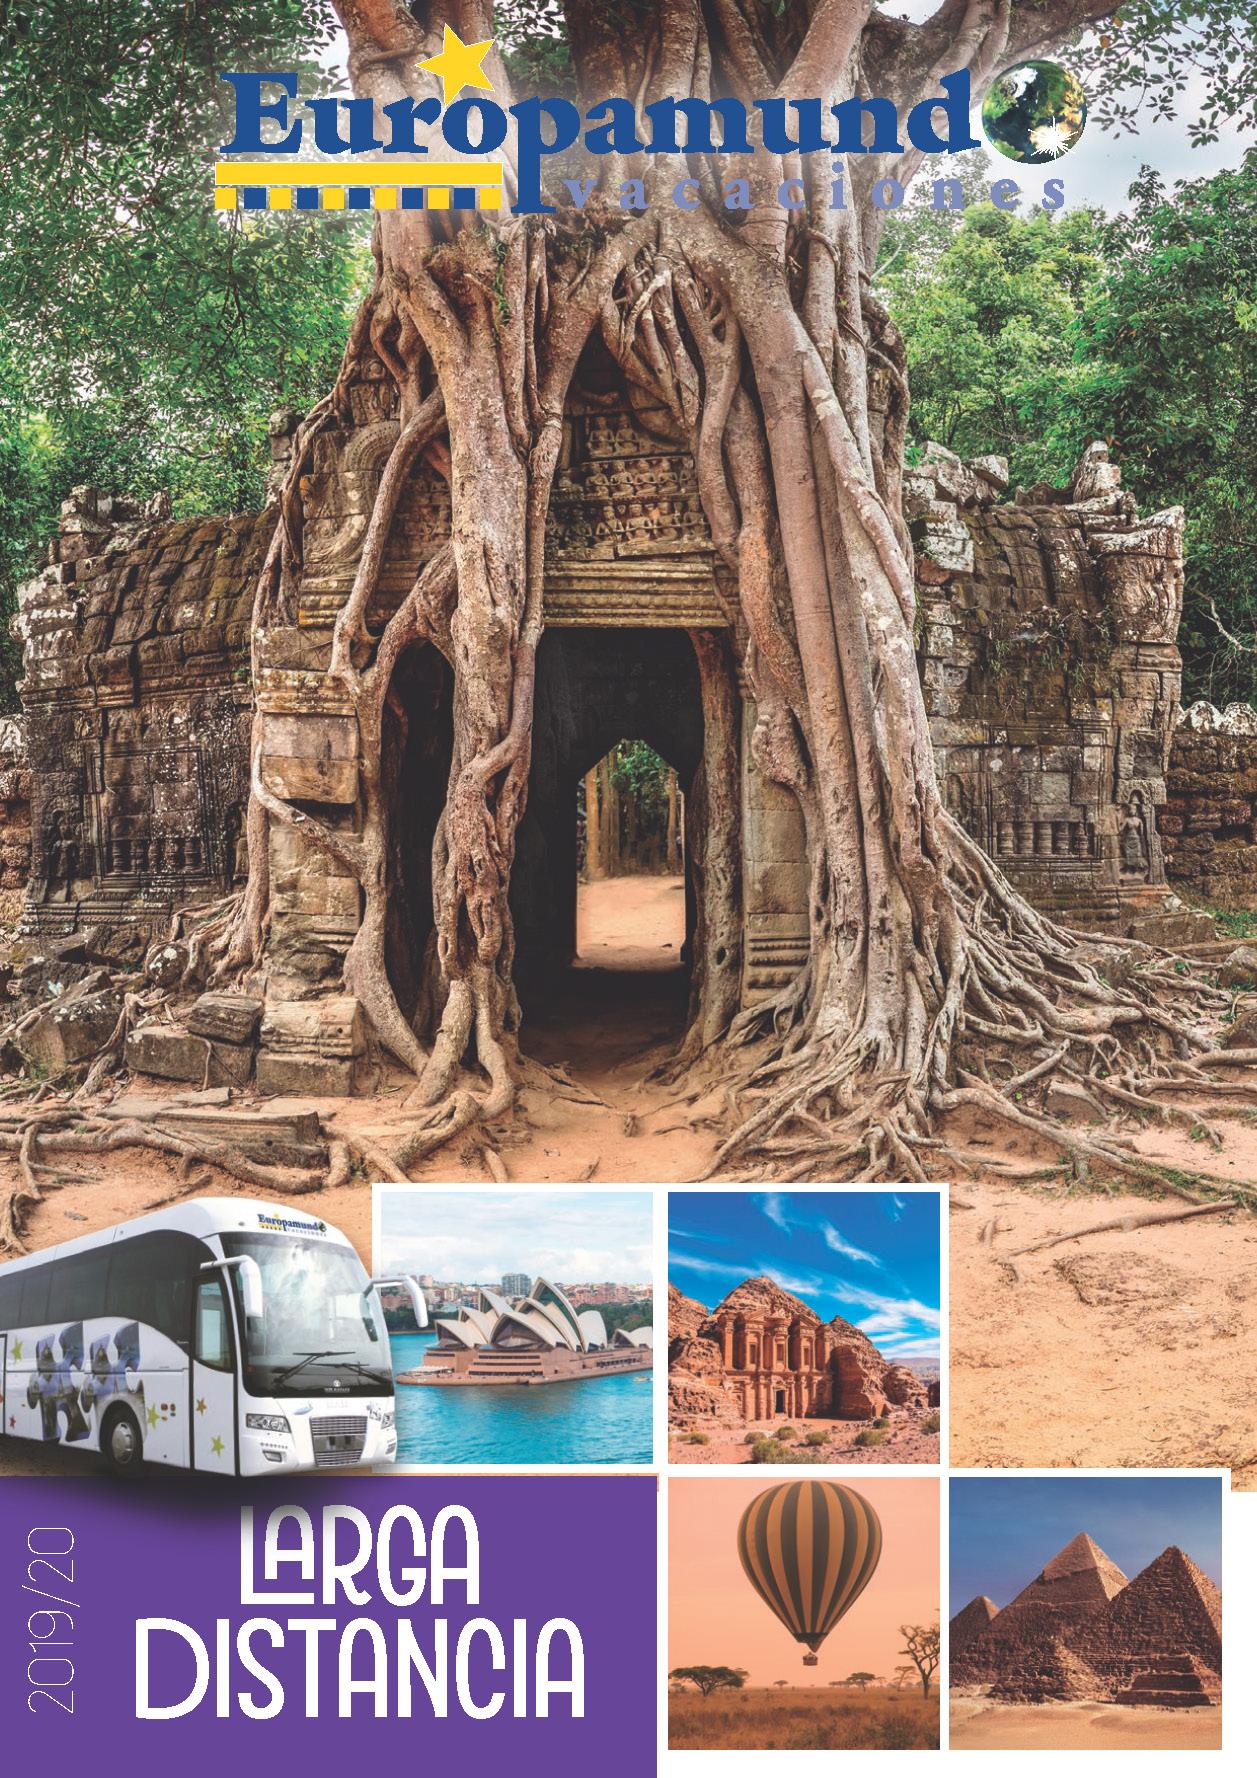 Catalogo Europamundo Asia Africa y Oceania 2019